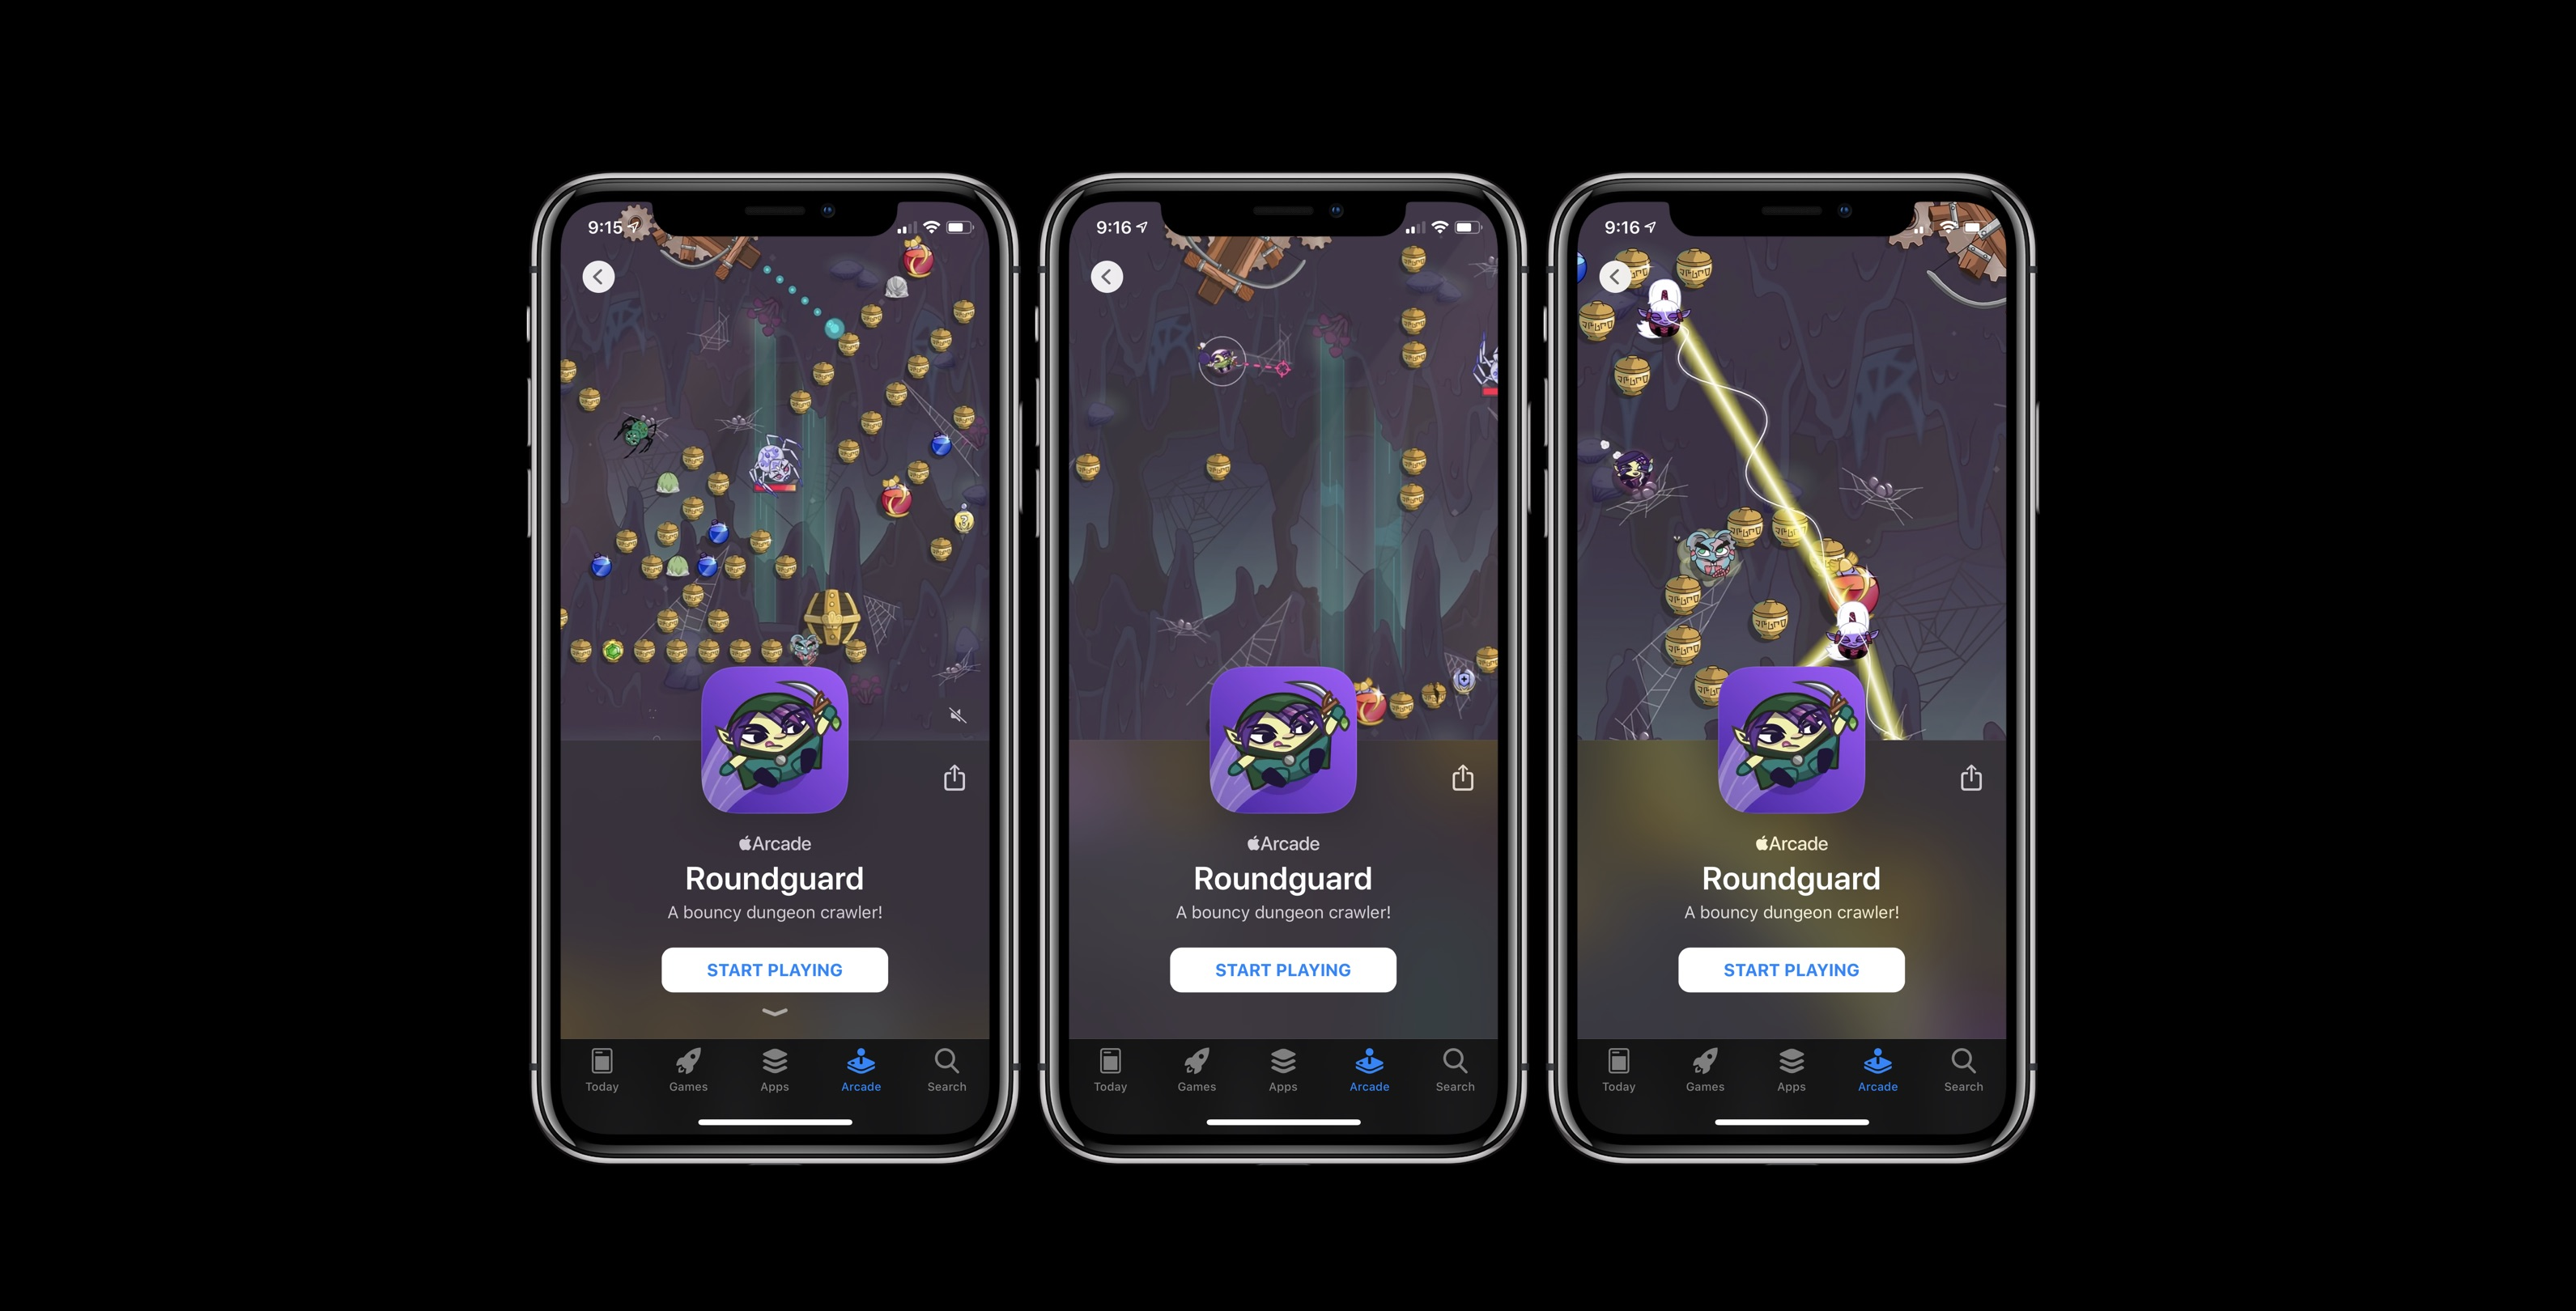 novo jogo Apple Arcade Roundguard 3/13